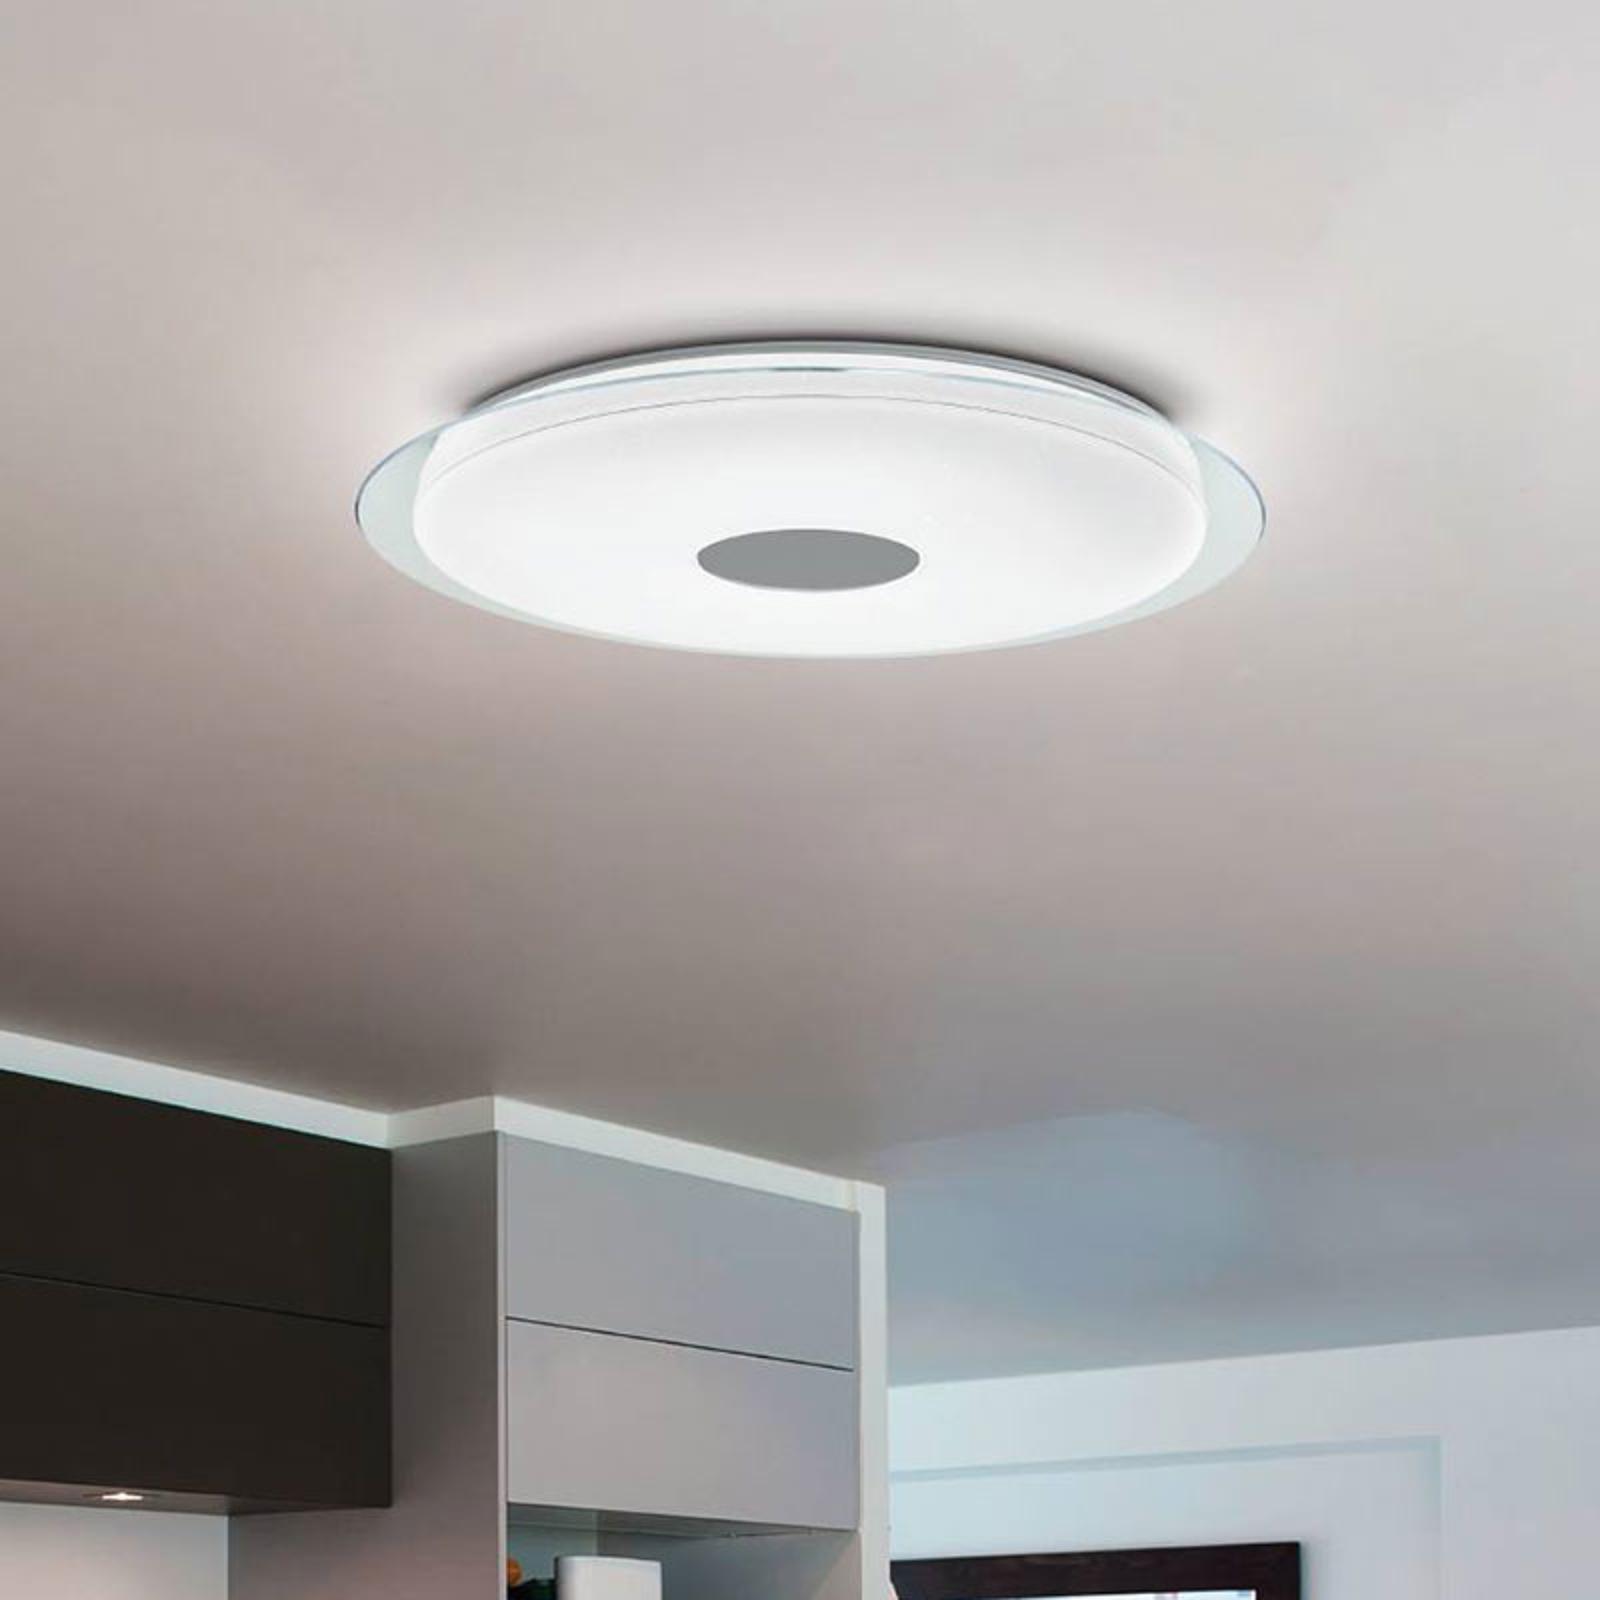 EGLO connect Lanciano-C LED-taklampe Ø 77cm